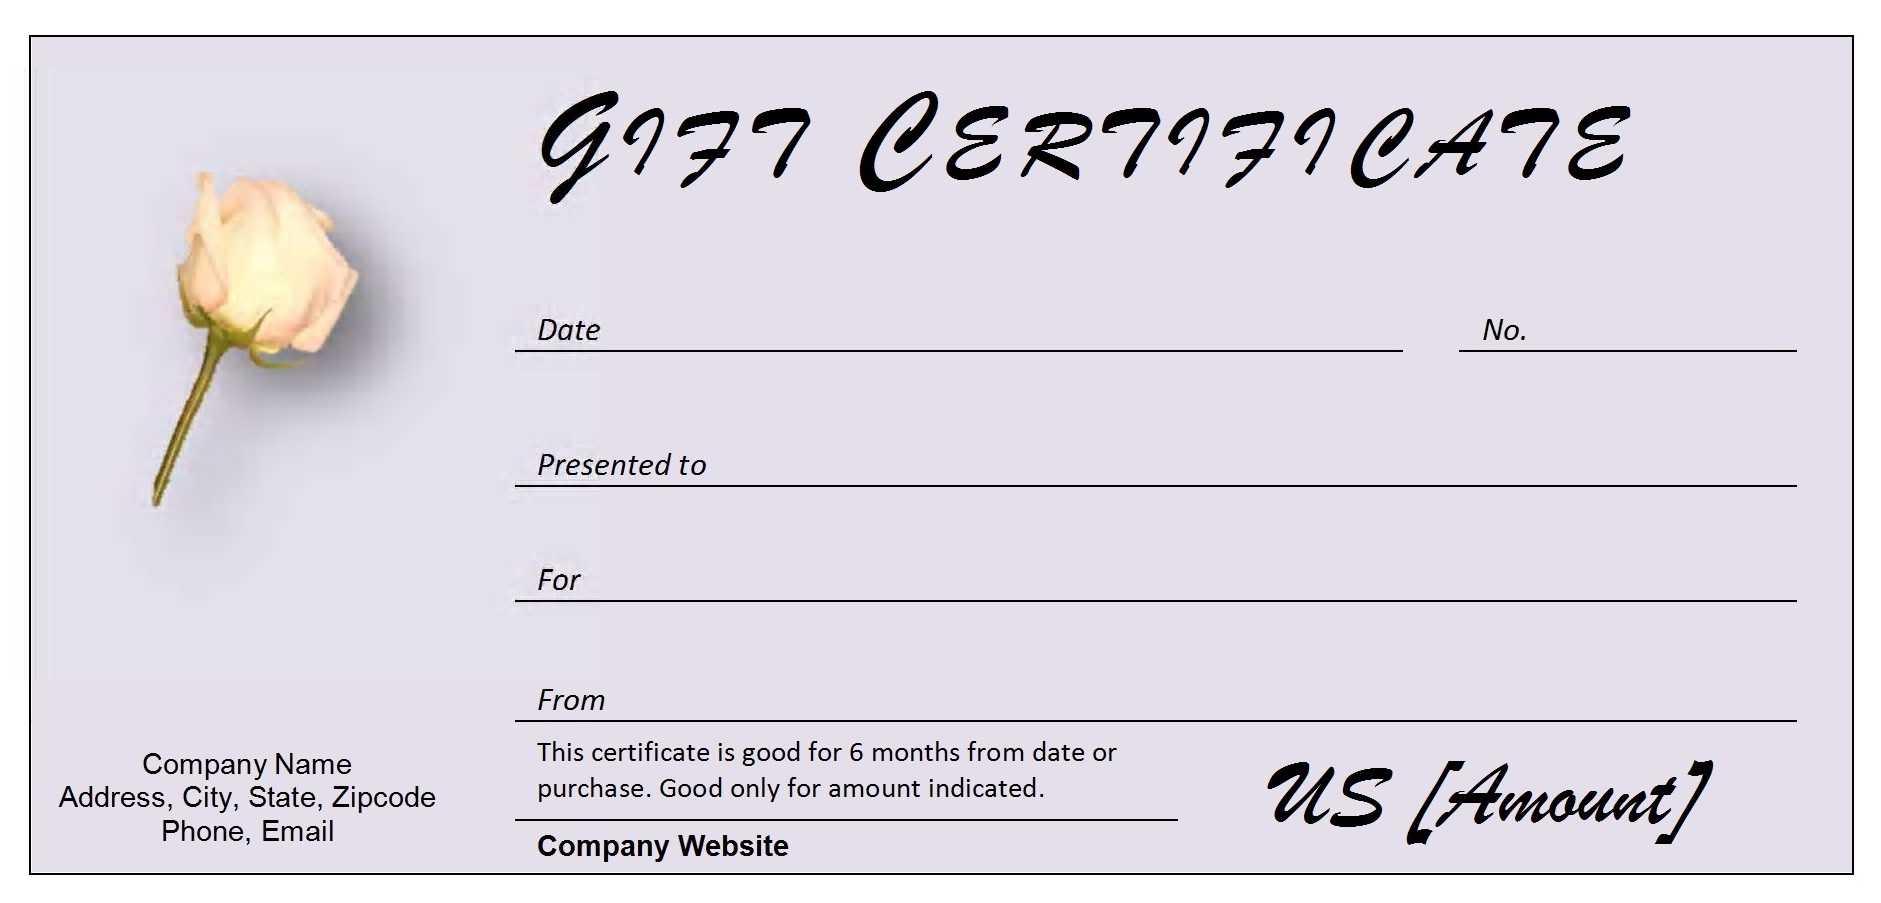 Certificates. Marvellous Donation Certificate Template throughout Donation Certificate Template